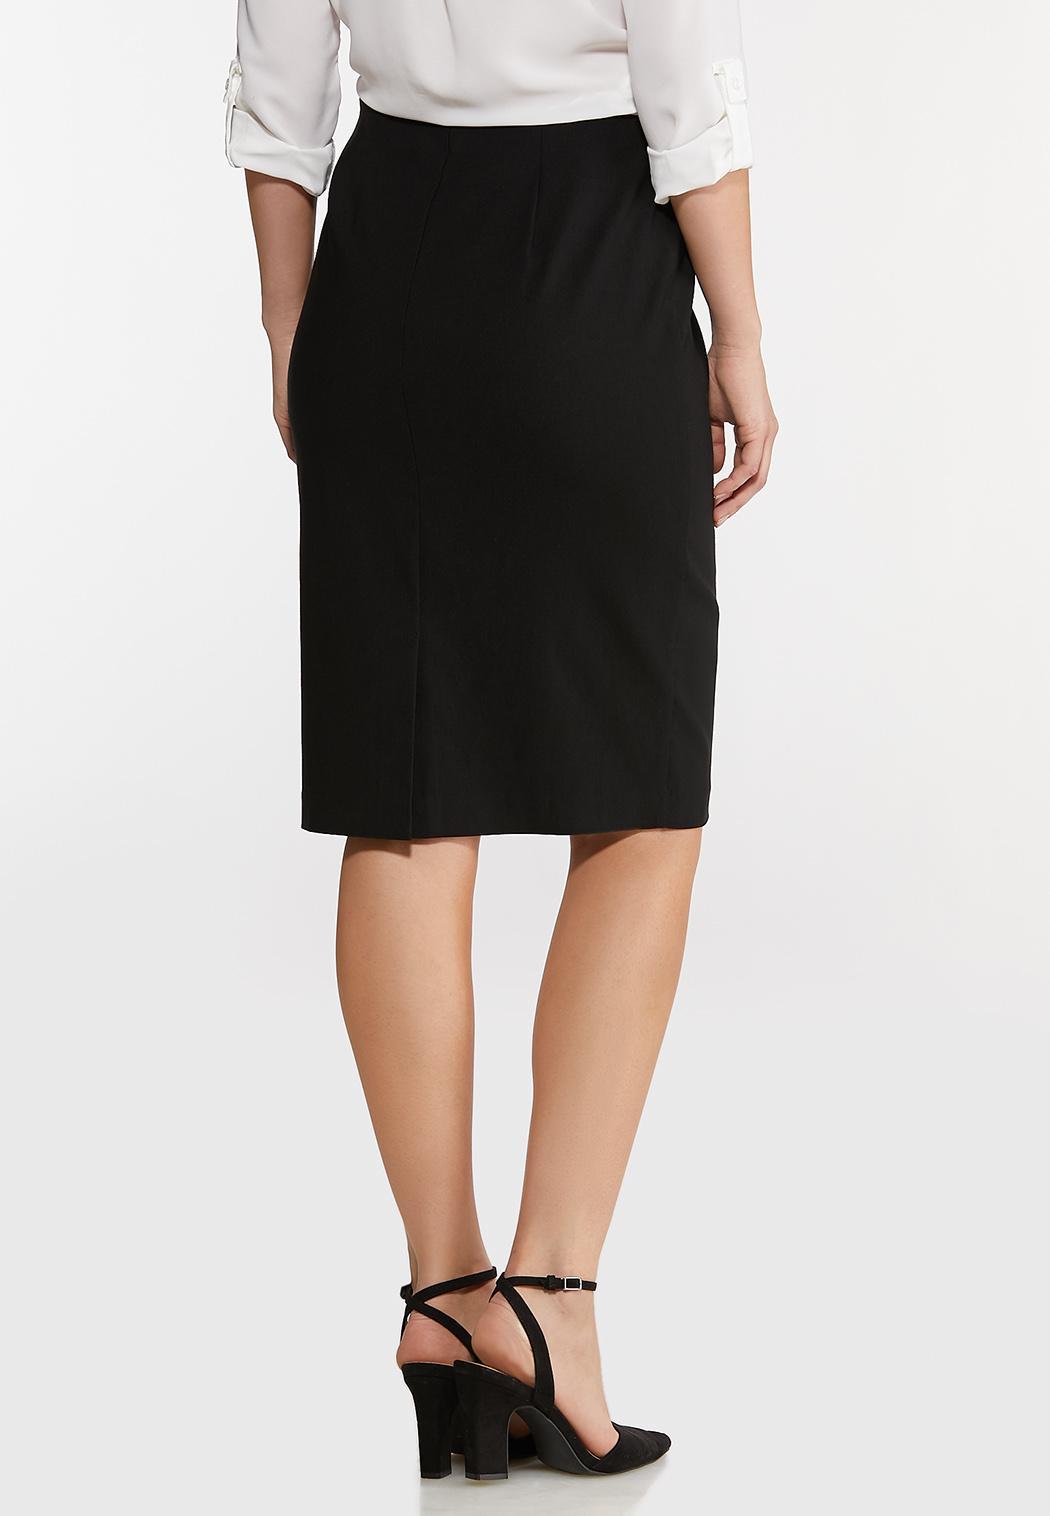 Black Bengaline Pencil Skirt (Item #44111040)